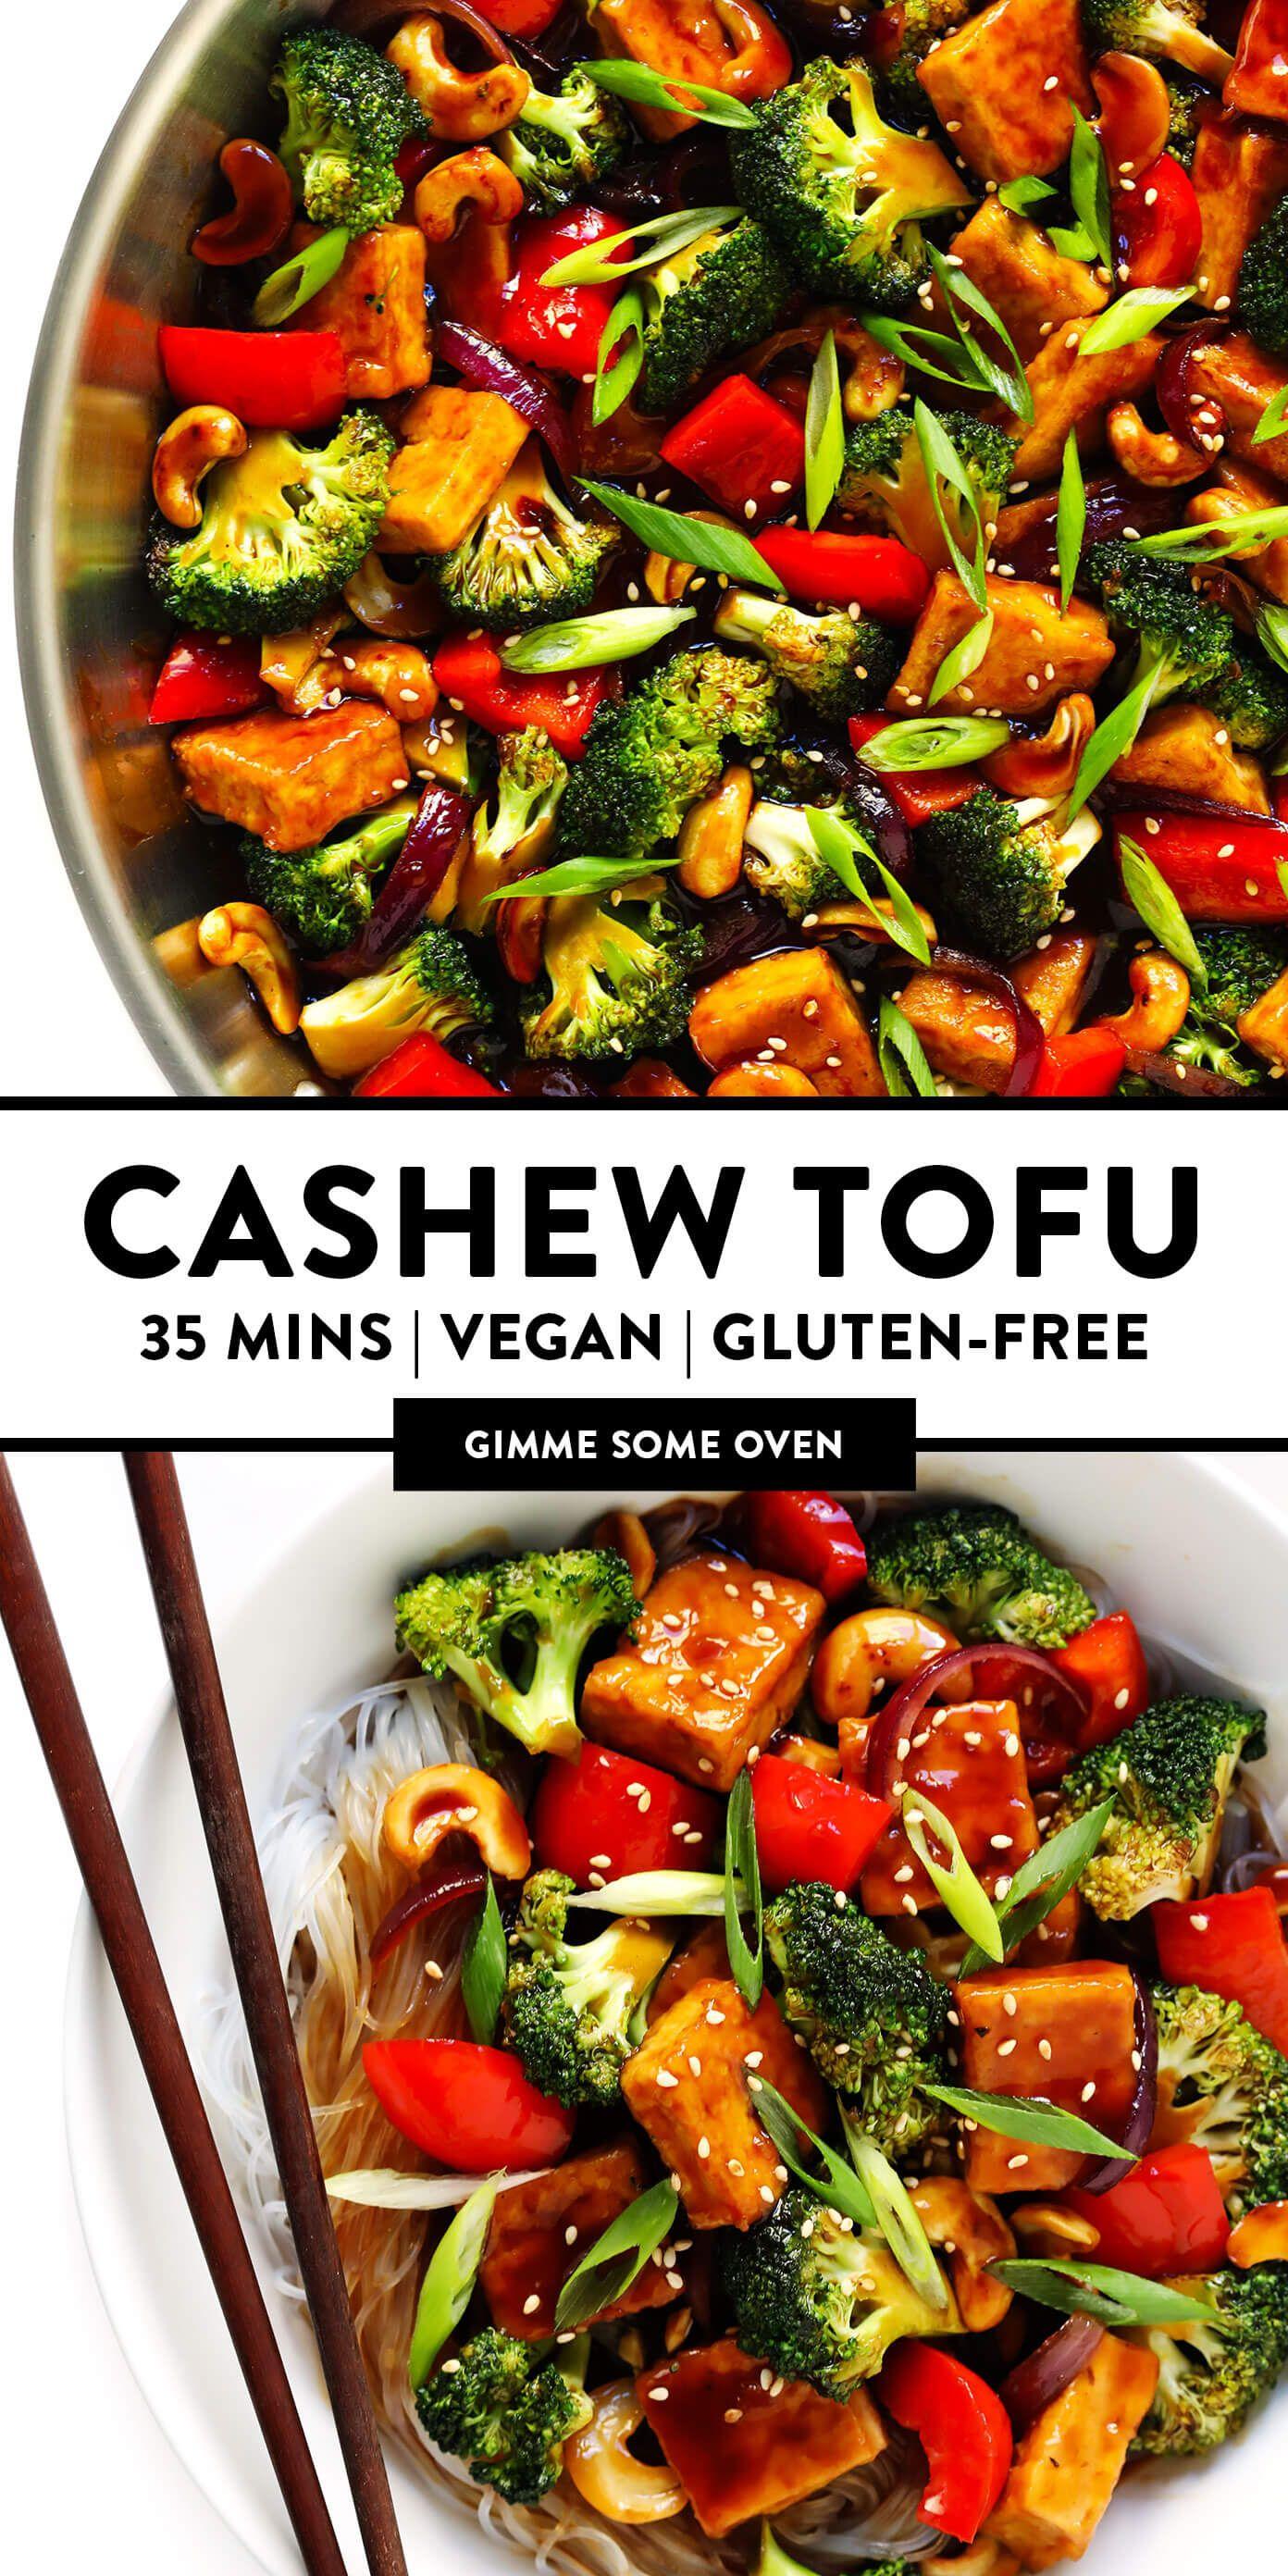 Cashew Tofu Recipe | Gimme Some Oven